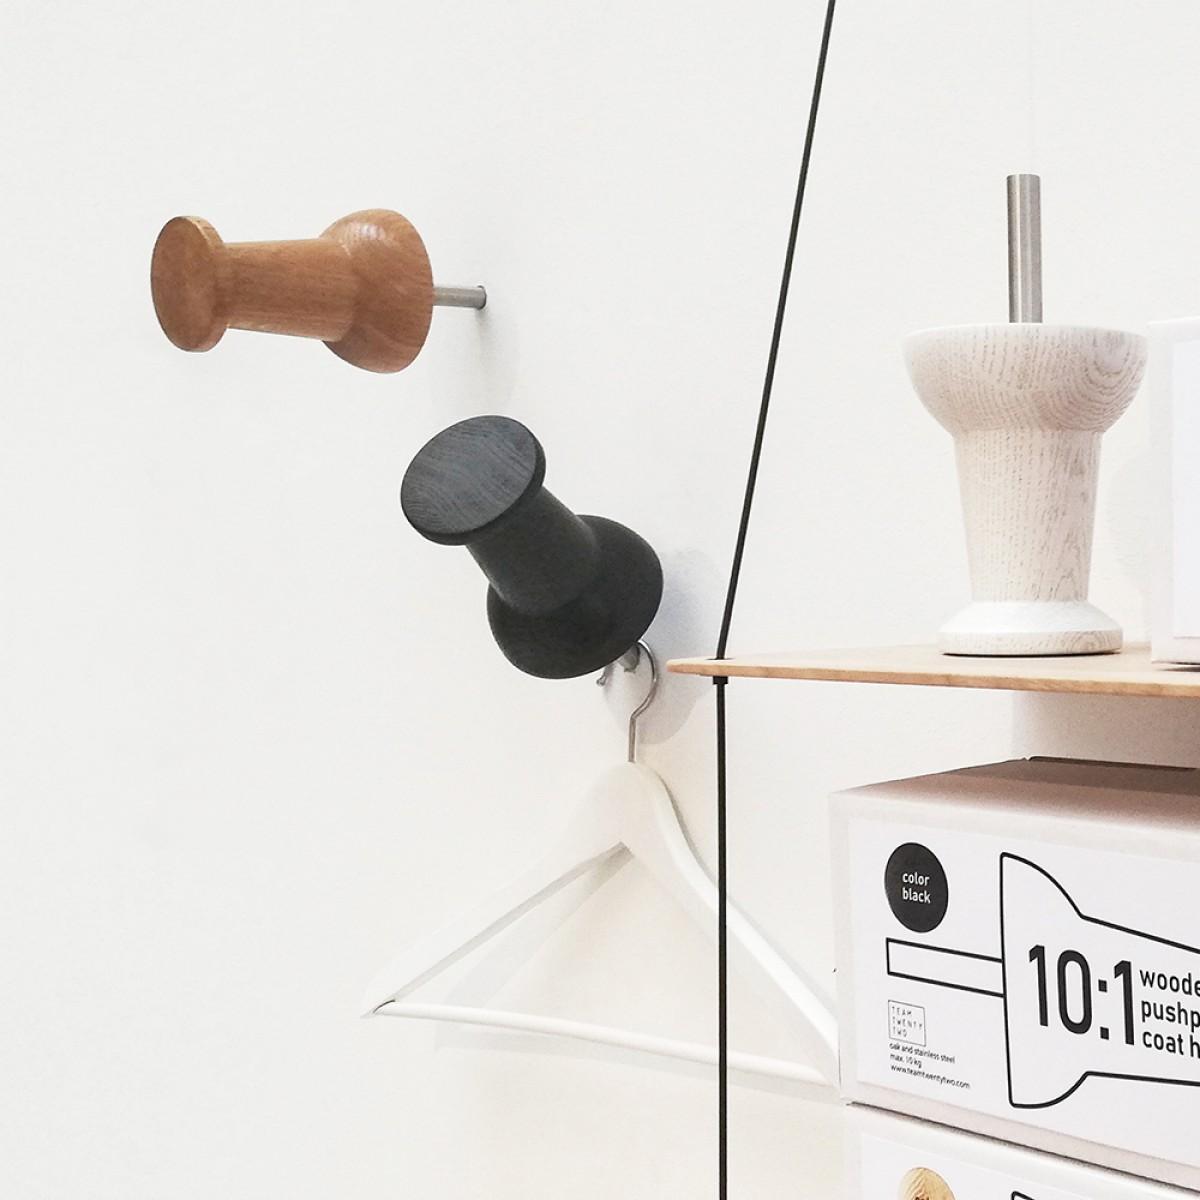 XXL wooden push pin // Garderobe // Wandhaken // Eiche klar